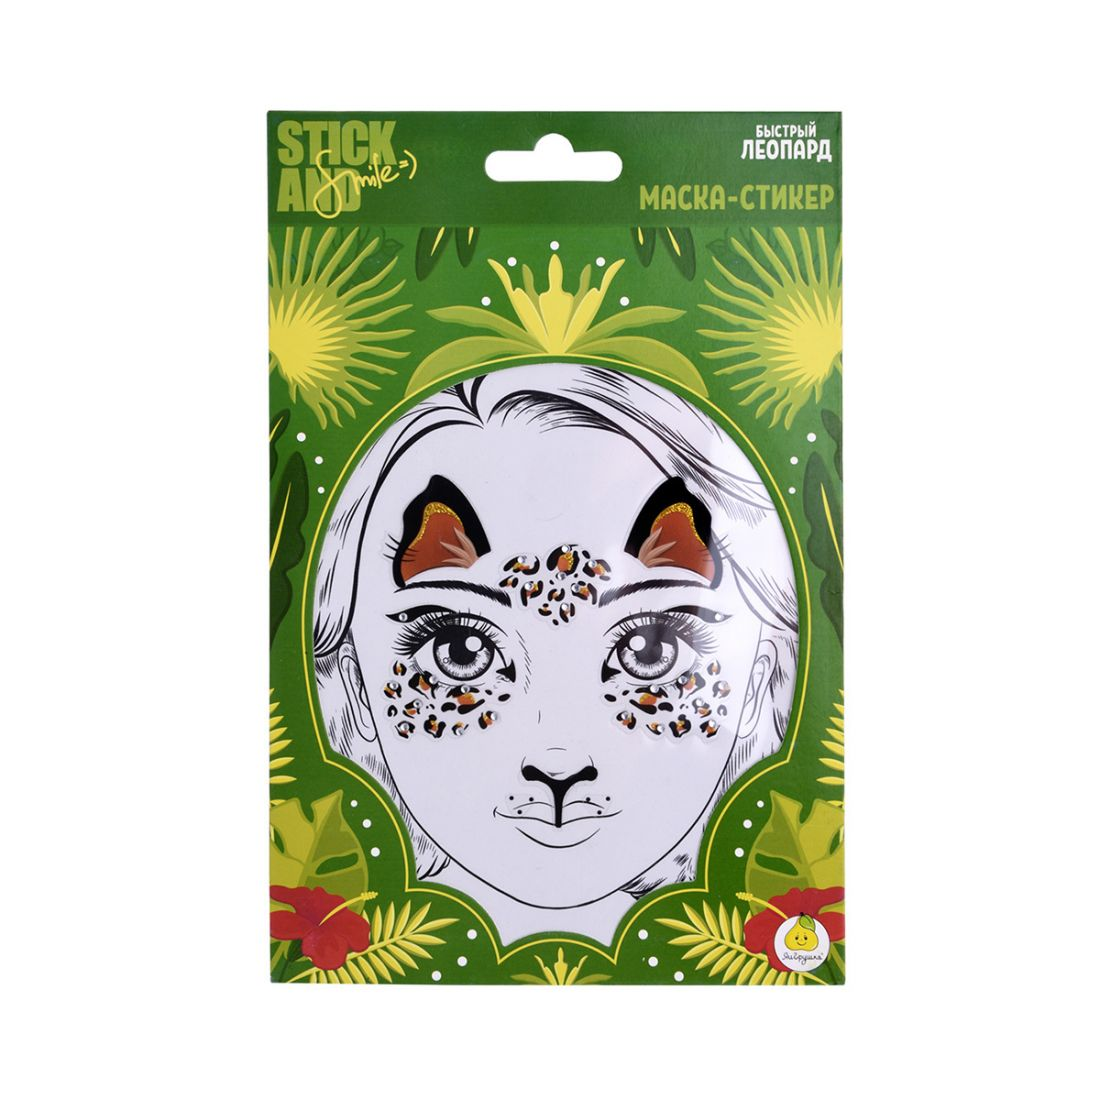 Маска-стикер STICK AND SMILE 12237 для лица Быстрый леопард